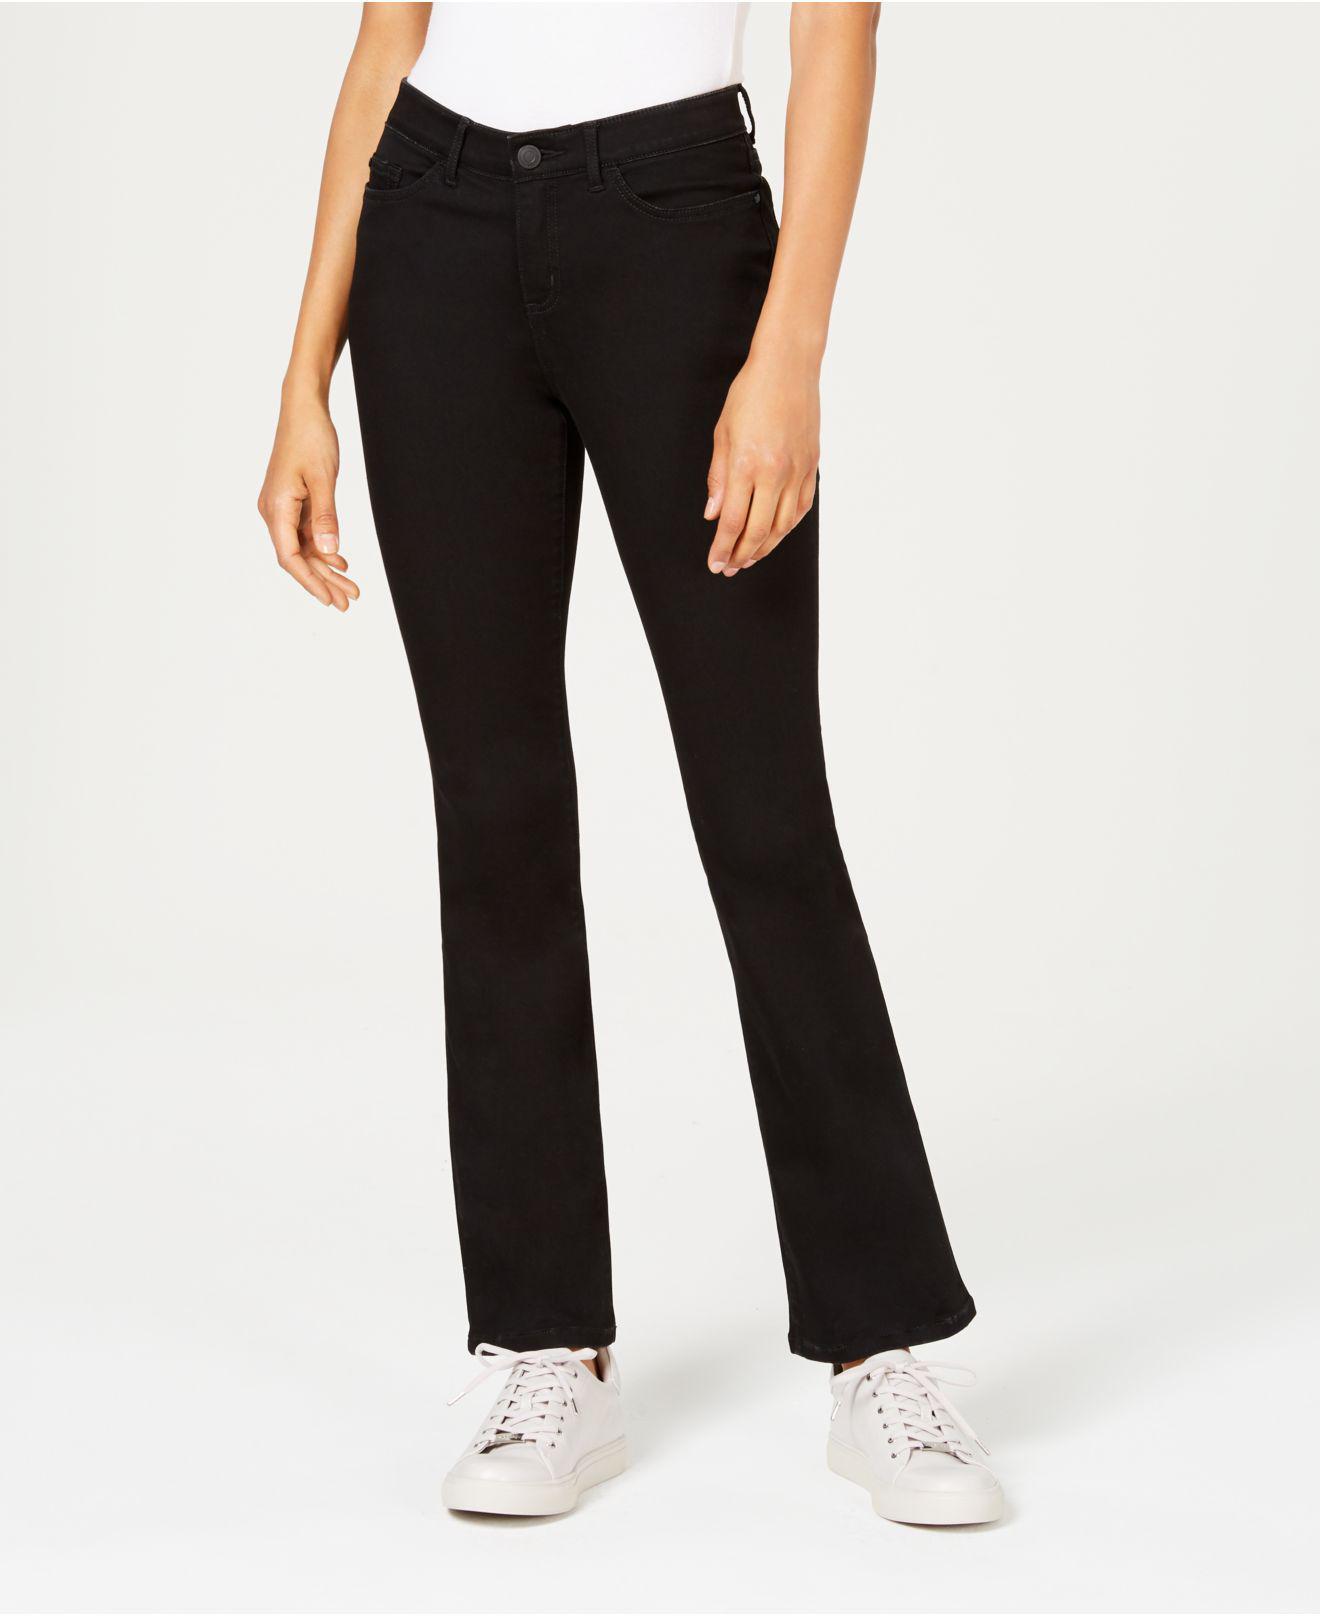 9b0dd09e Lyst - Lee Platinum Petite Flex Motion Bootcut Jeans in Black